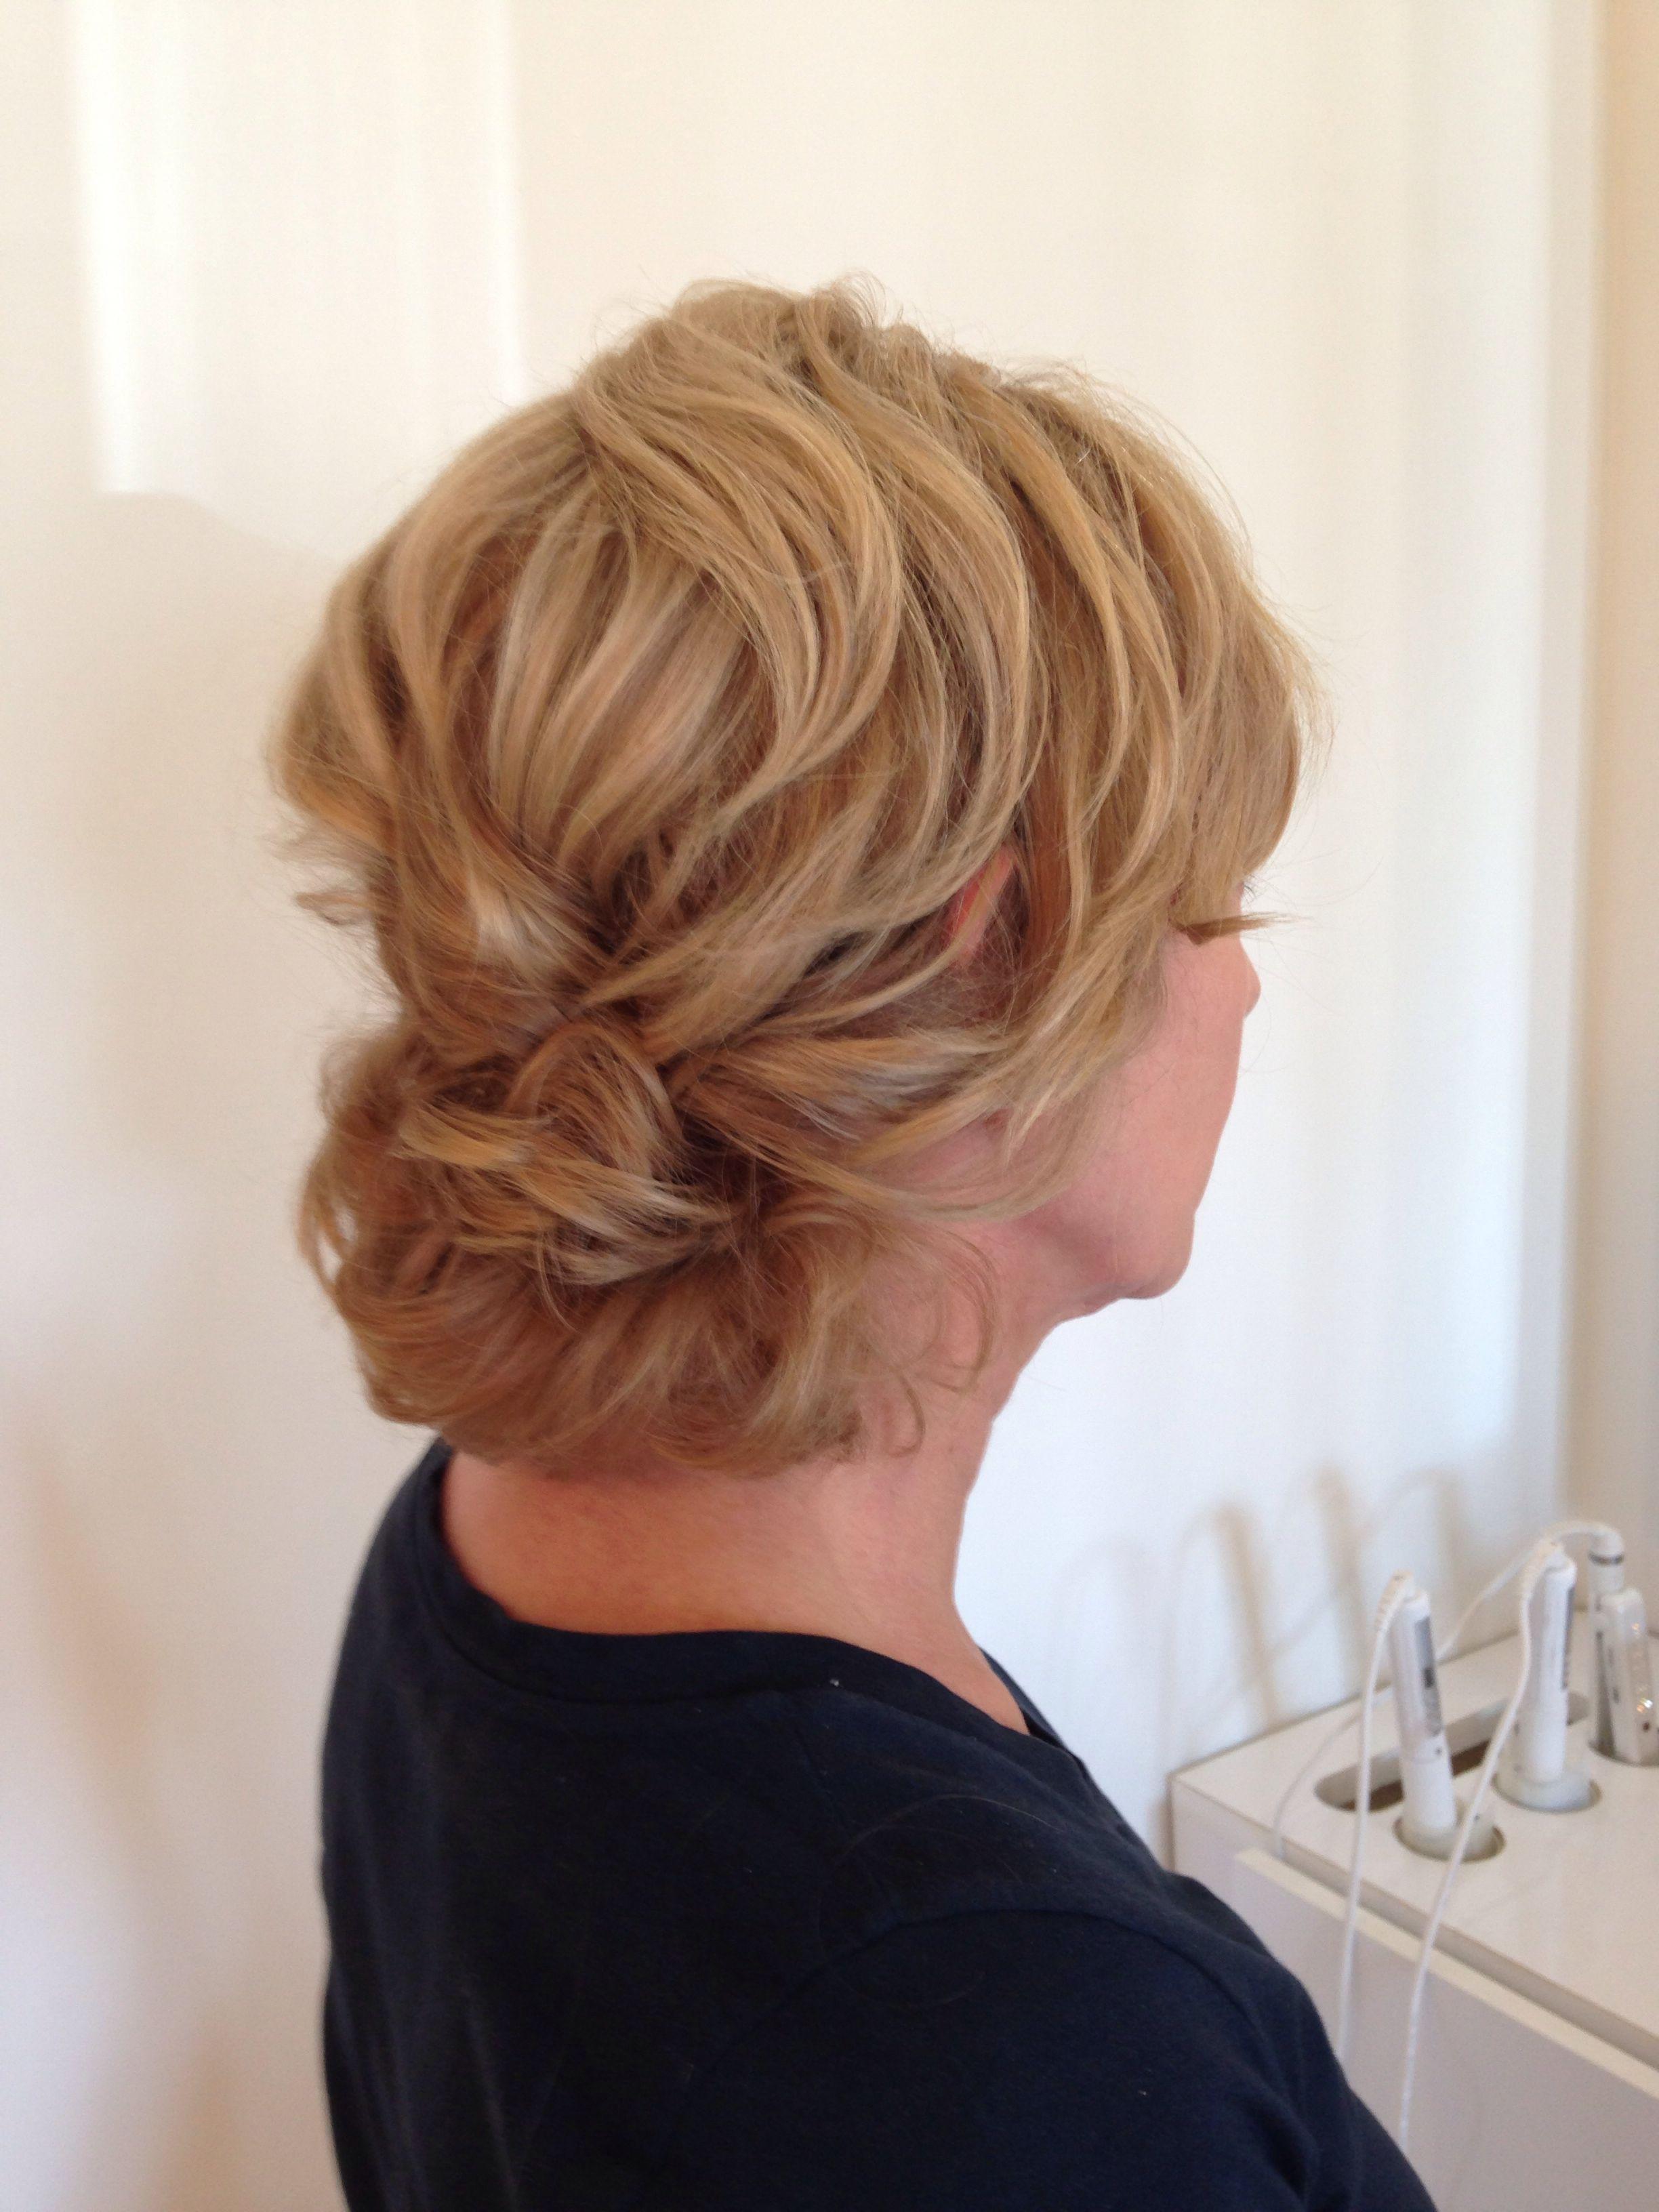 mother of bride - medium to short hair | wedding hairstyles